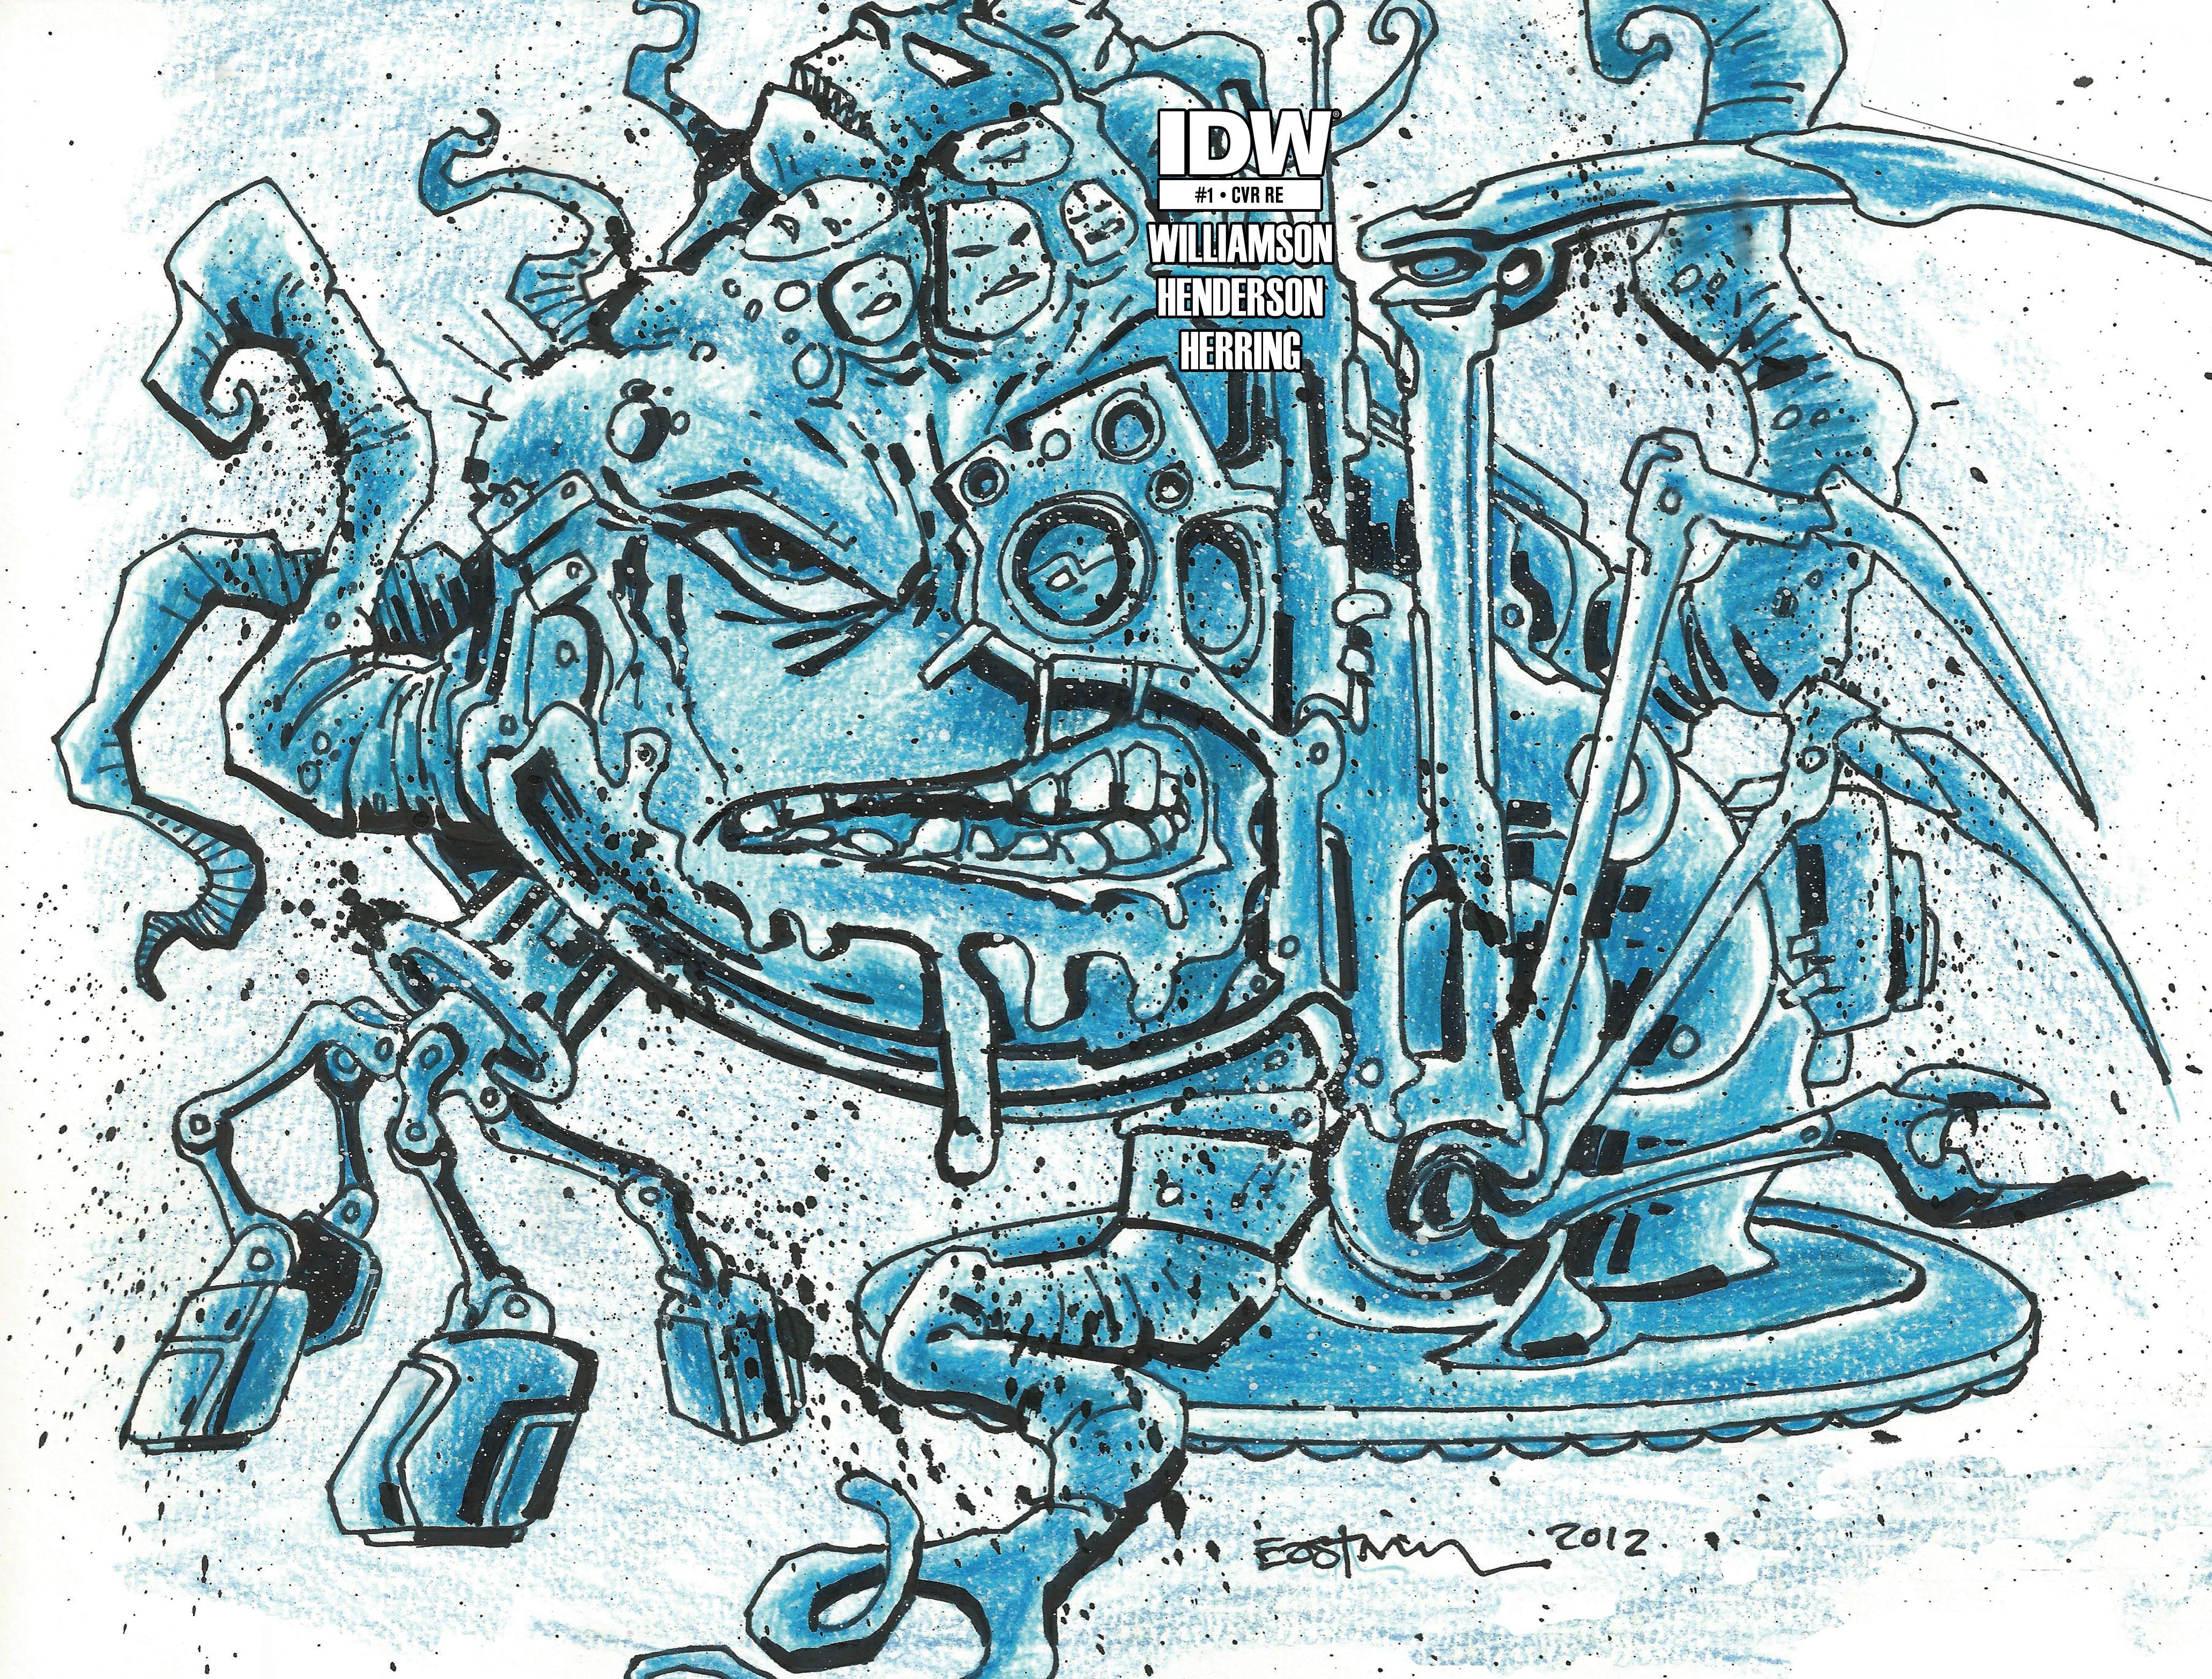 Cover RE Jetpack Comics (Kevin Eastman)